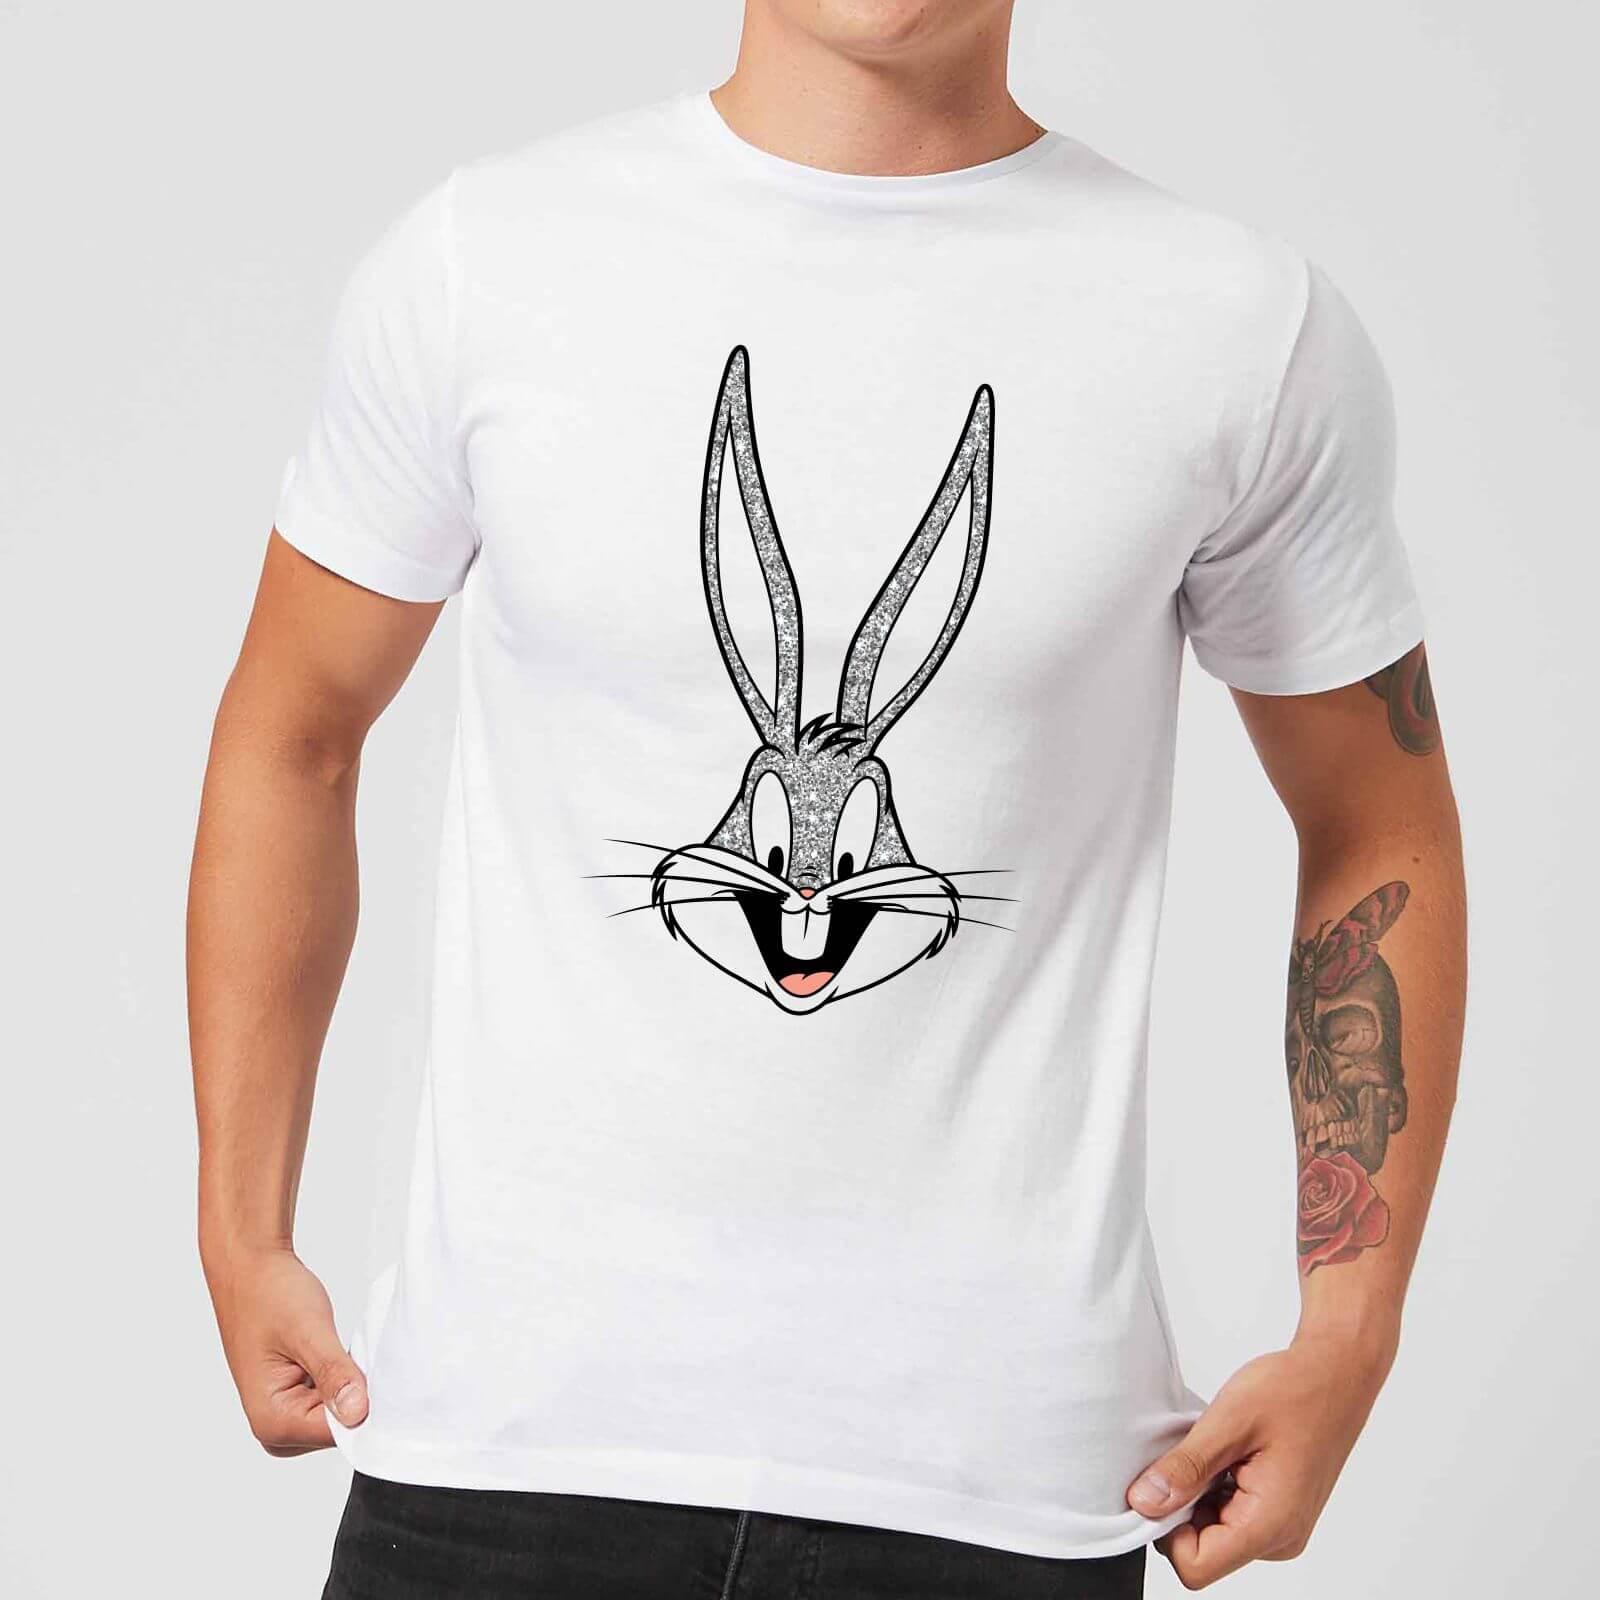 Looney Tunes Bugs Bunny Men's T-Shirt - White - XXL - White